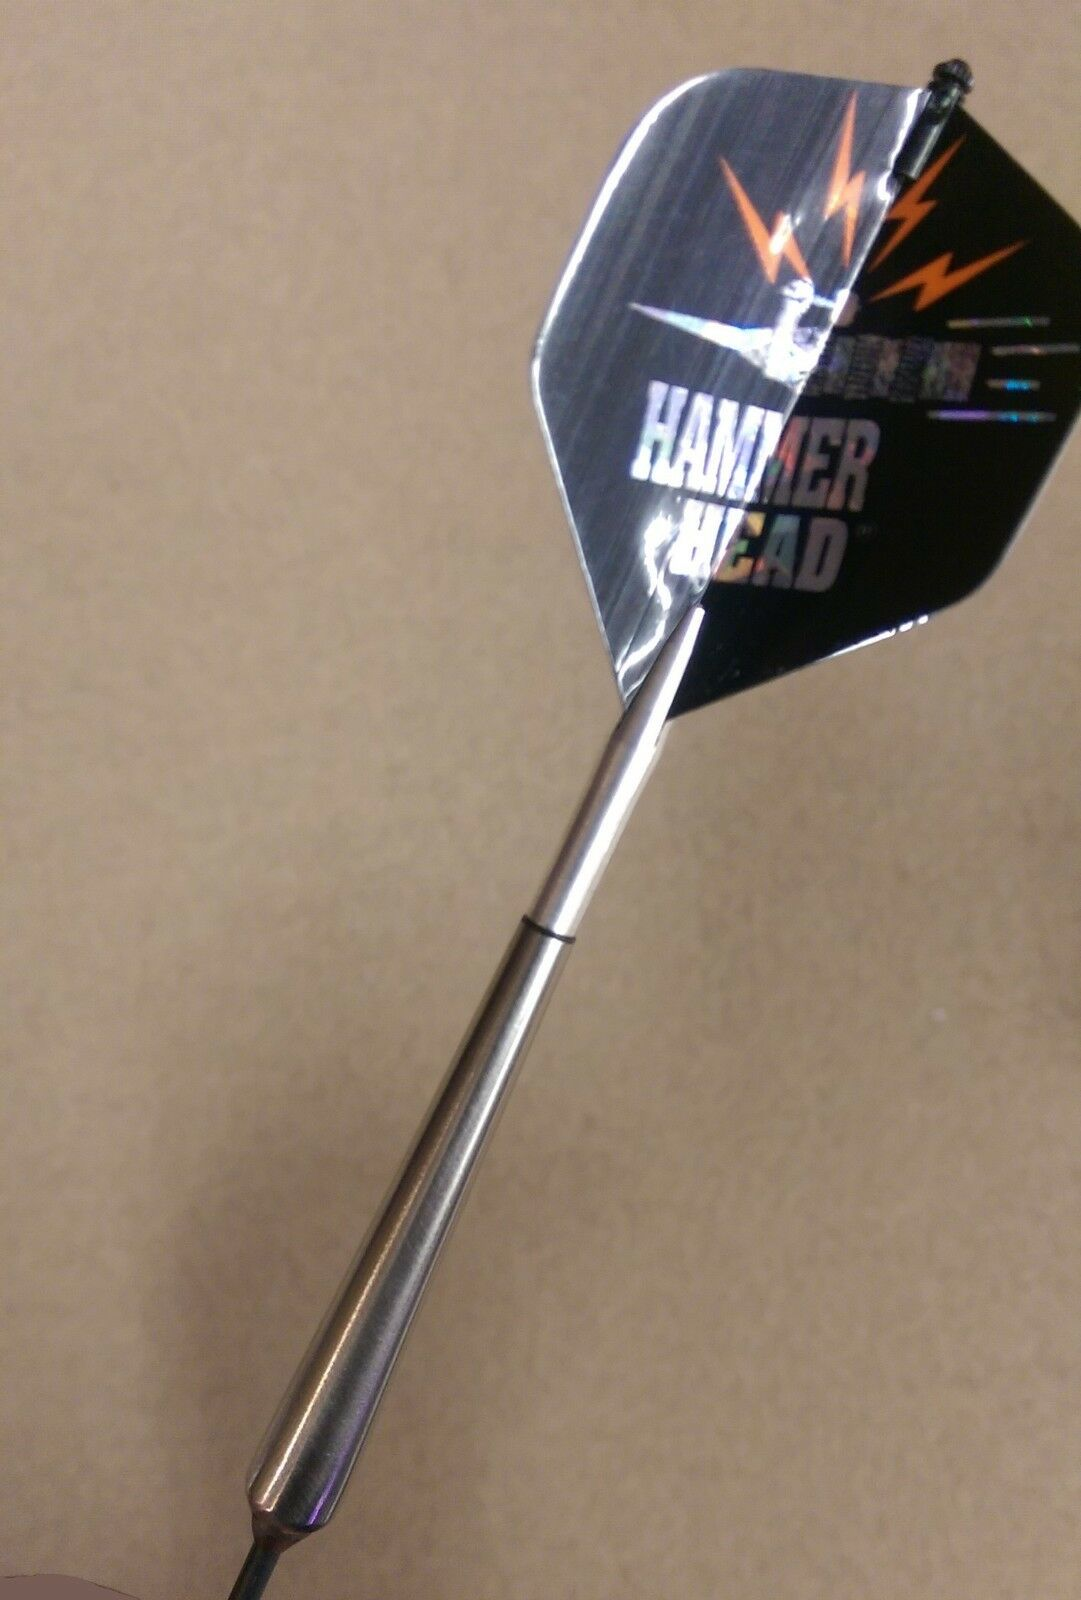 Hammer Head Head Head GT G.T. 24g Steel Tip Darts 90% Tungsten 249GT w/ FREE Shipping 329b1d